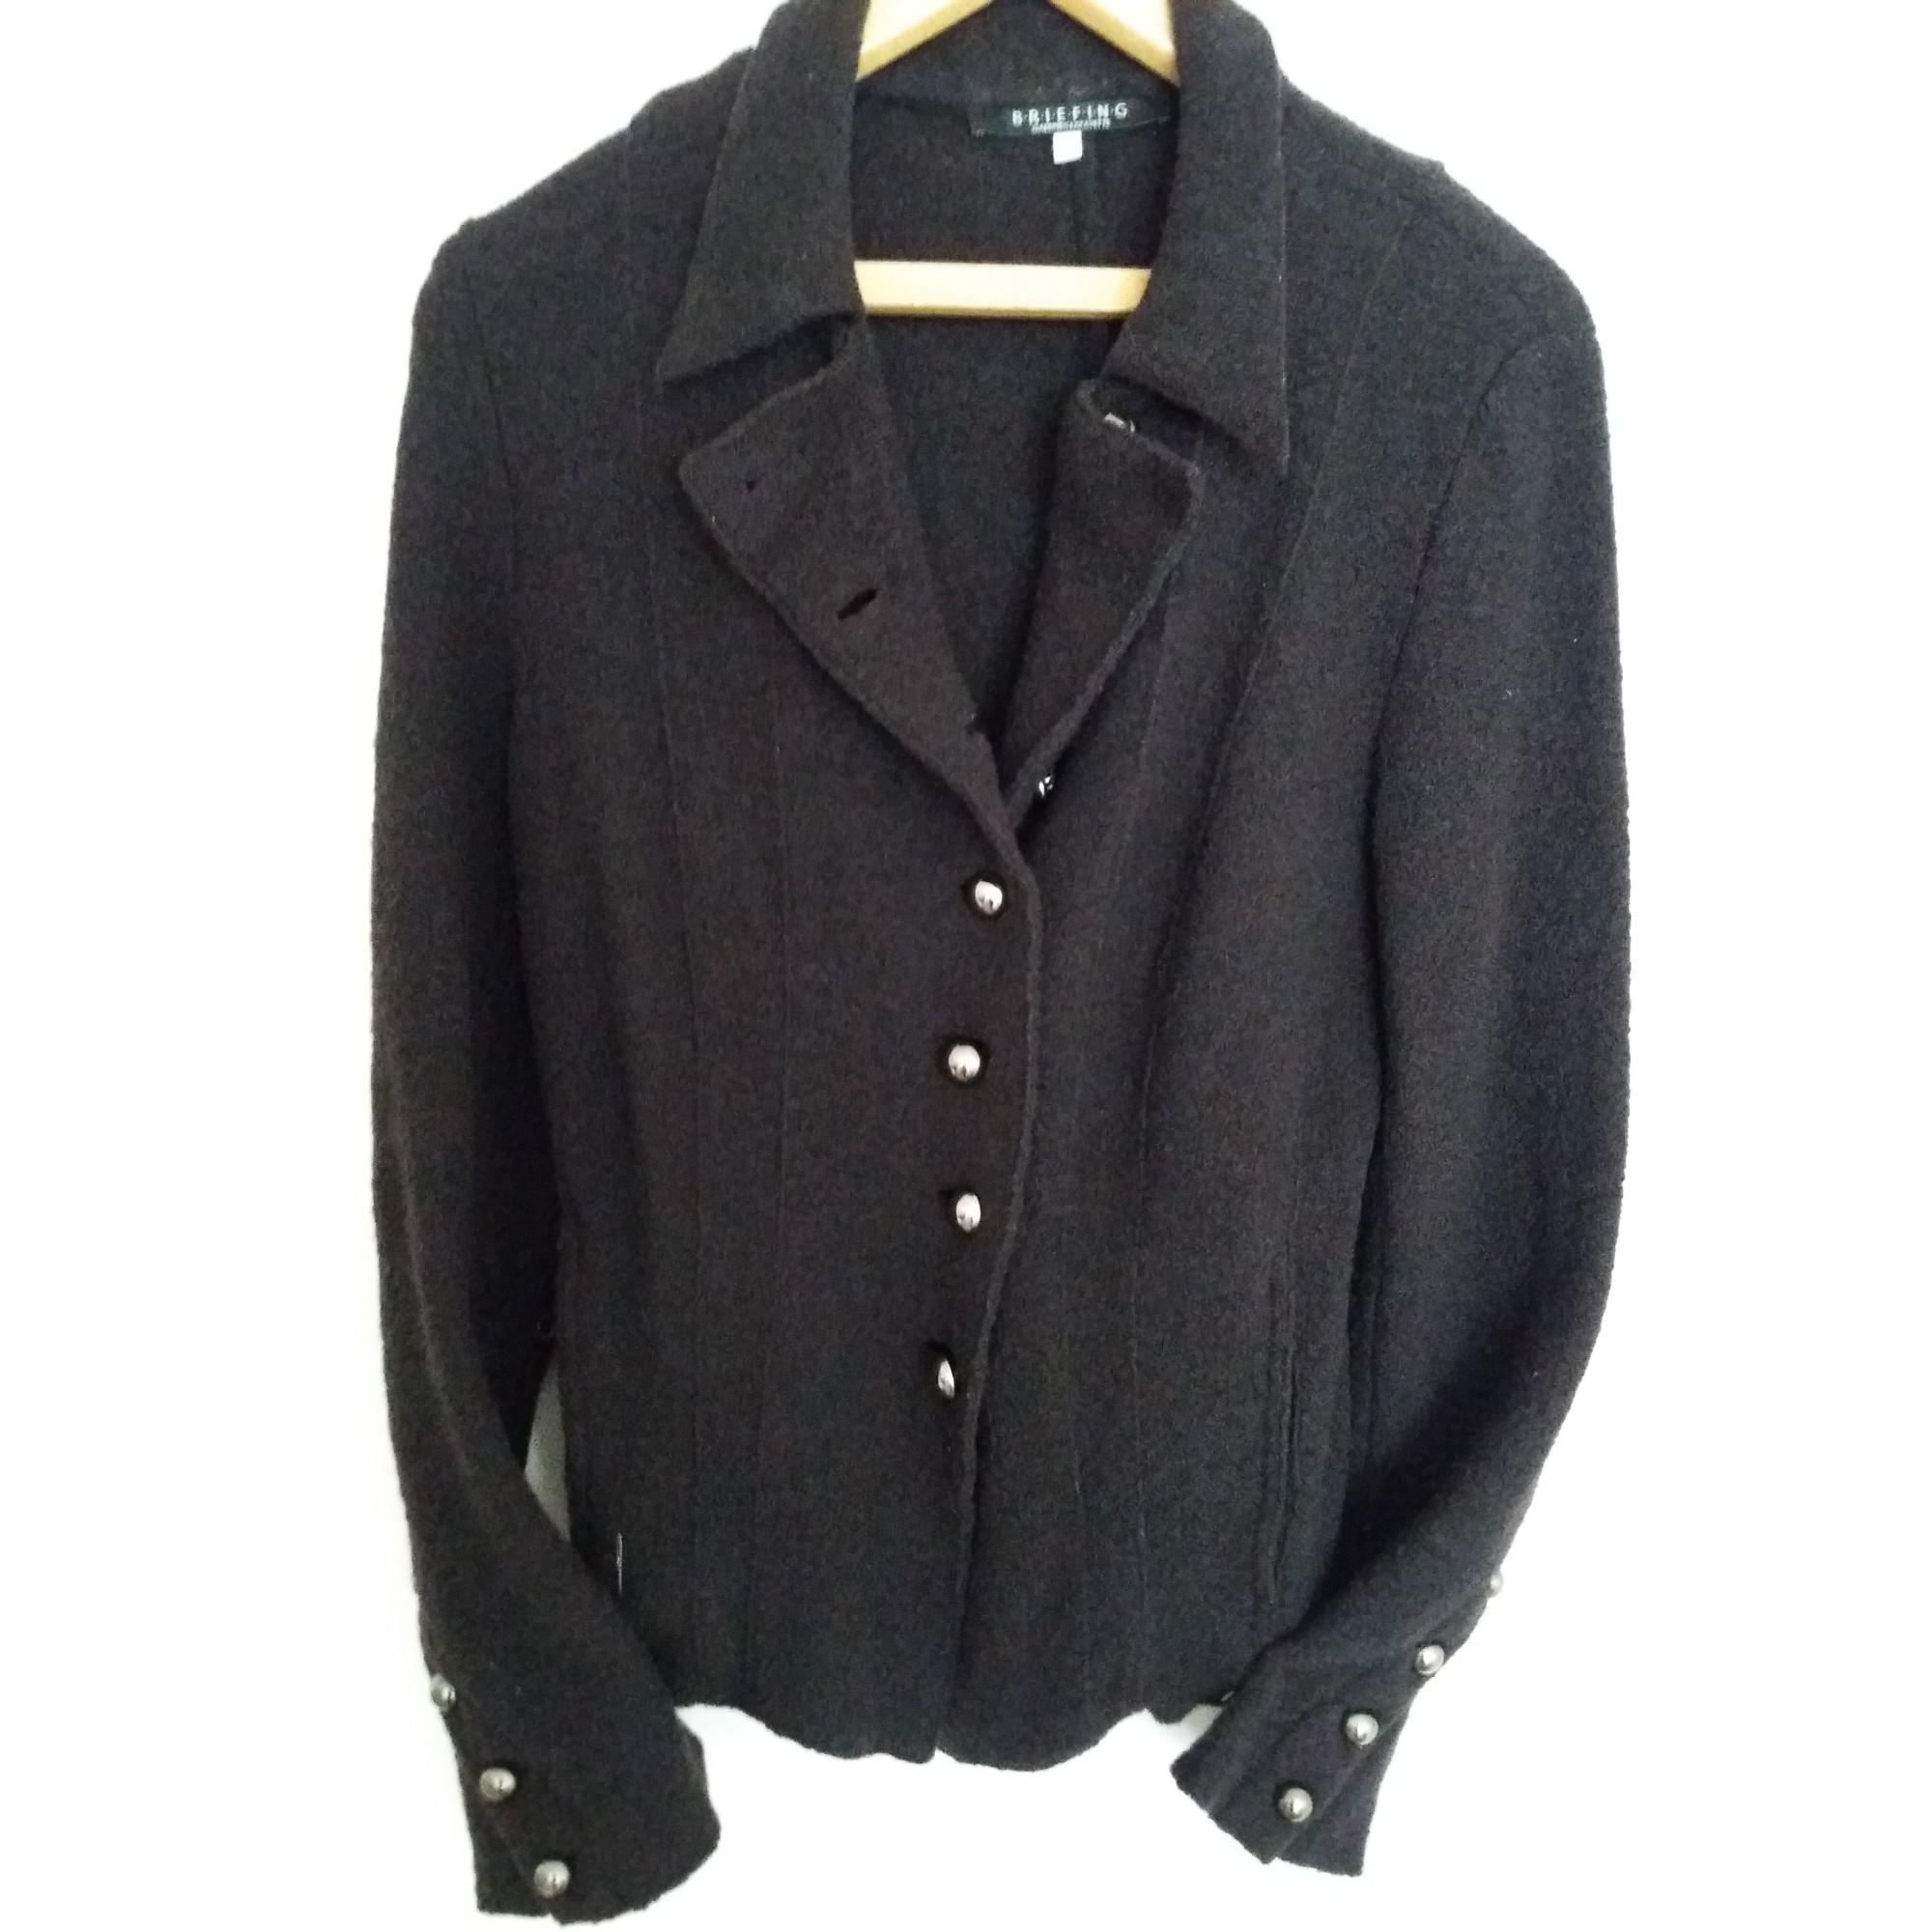 Blazer, veste tailleur BRIEFING Marron